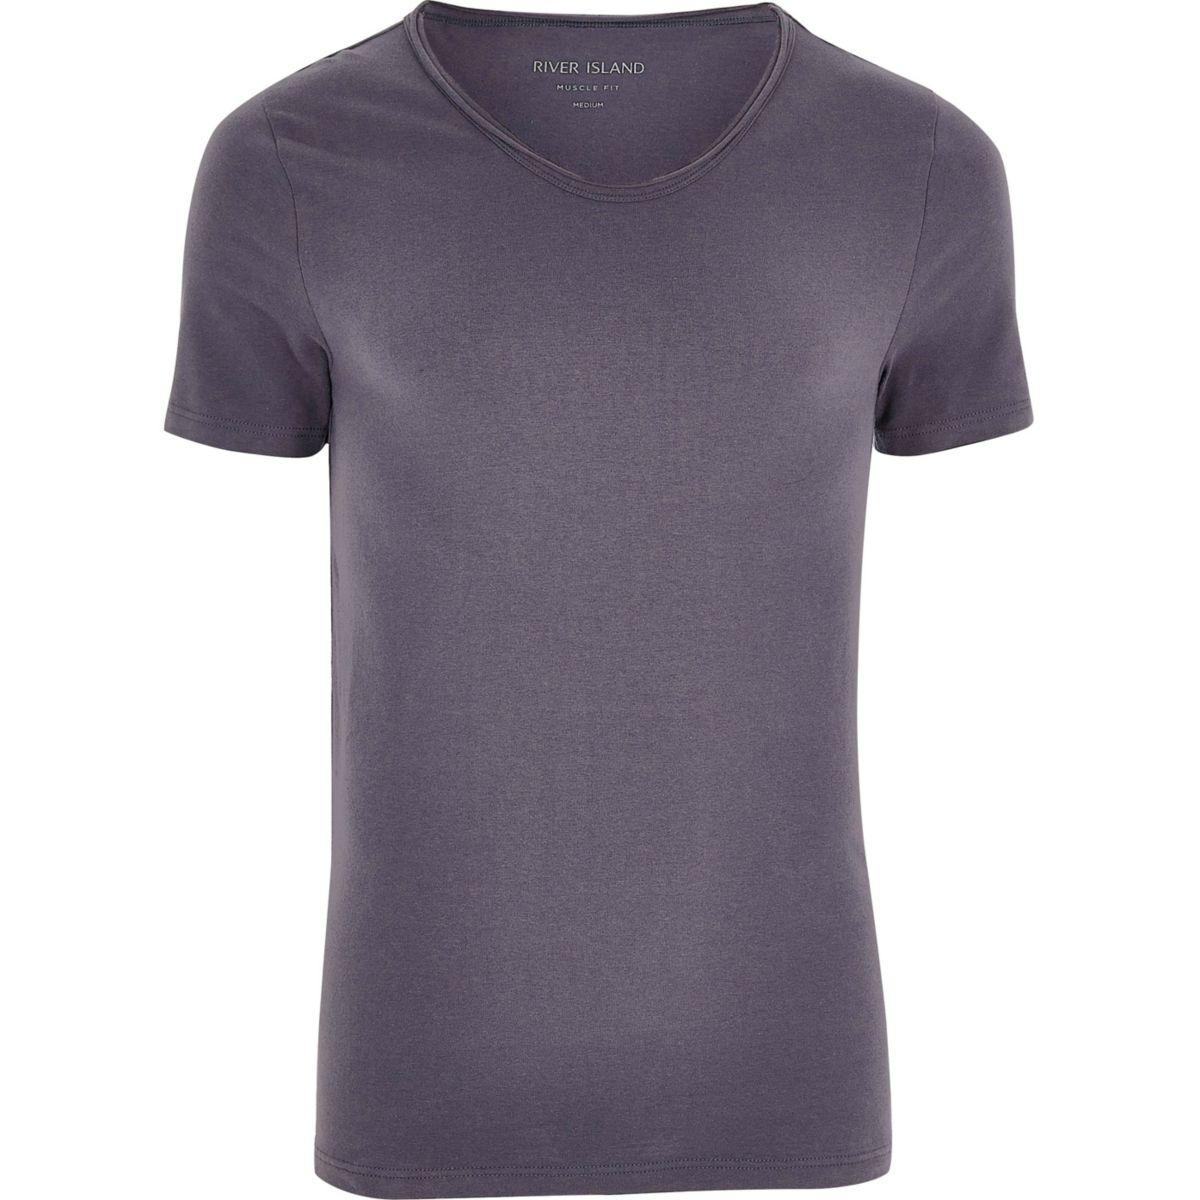 Dark grey scoop V-neck muscle fit T-shirt